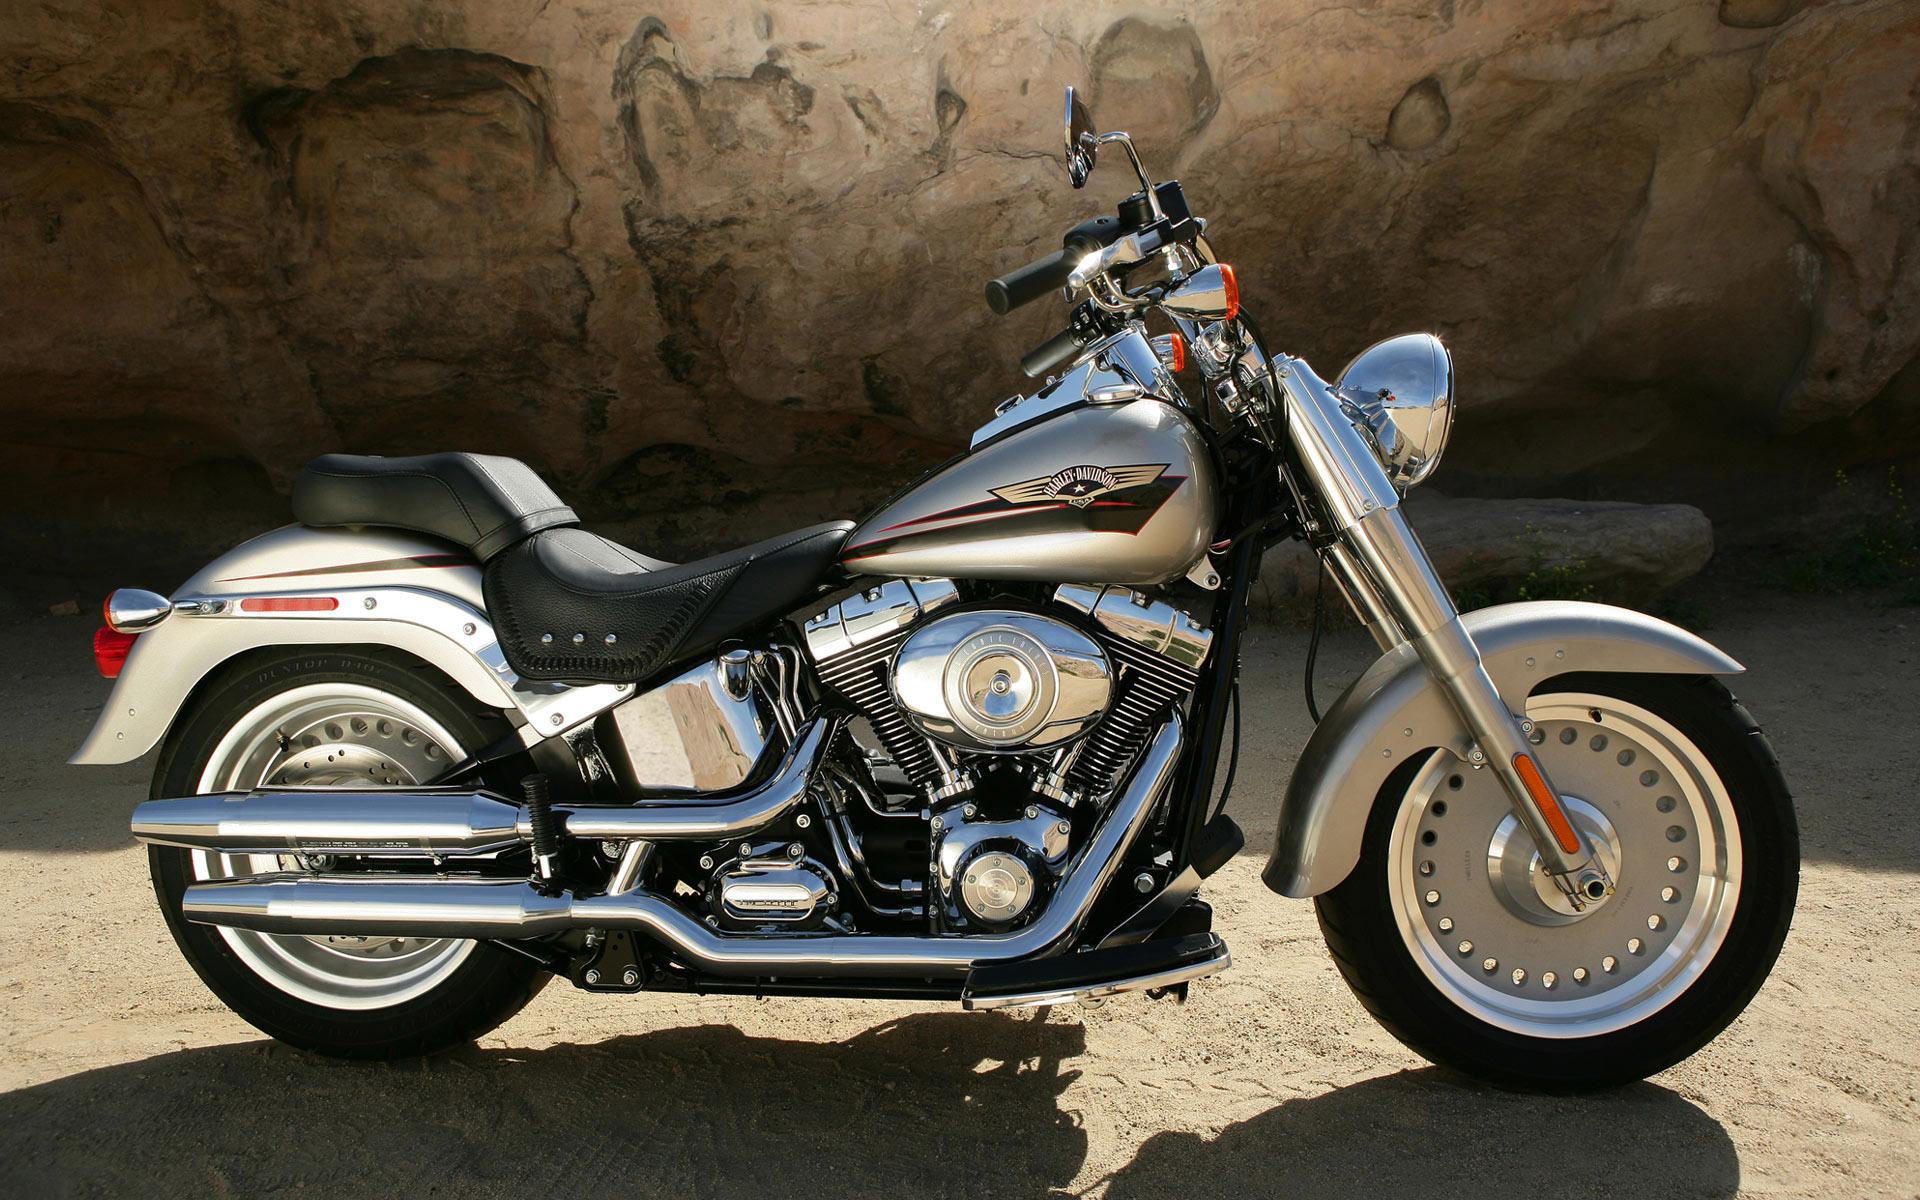 Harley Davidson HD wallpaper 1920 x 1200 pictures 22jpg Harley 33jpg 1920x1200